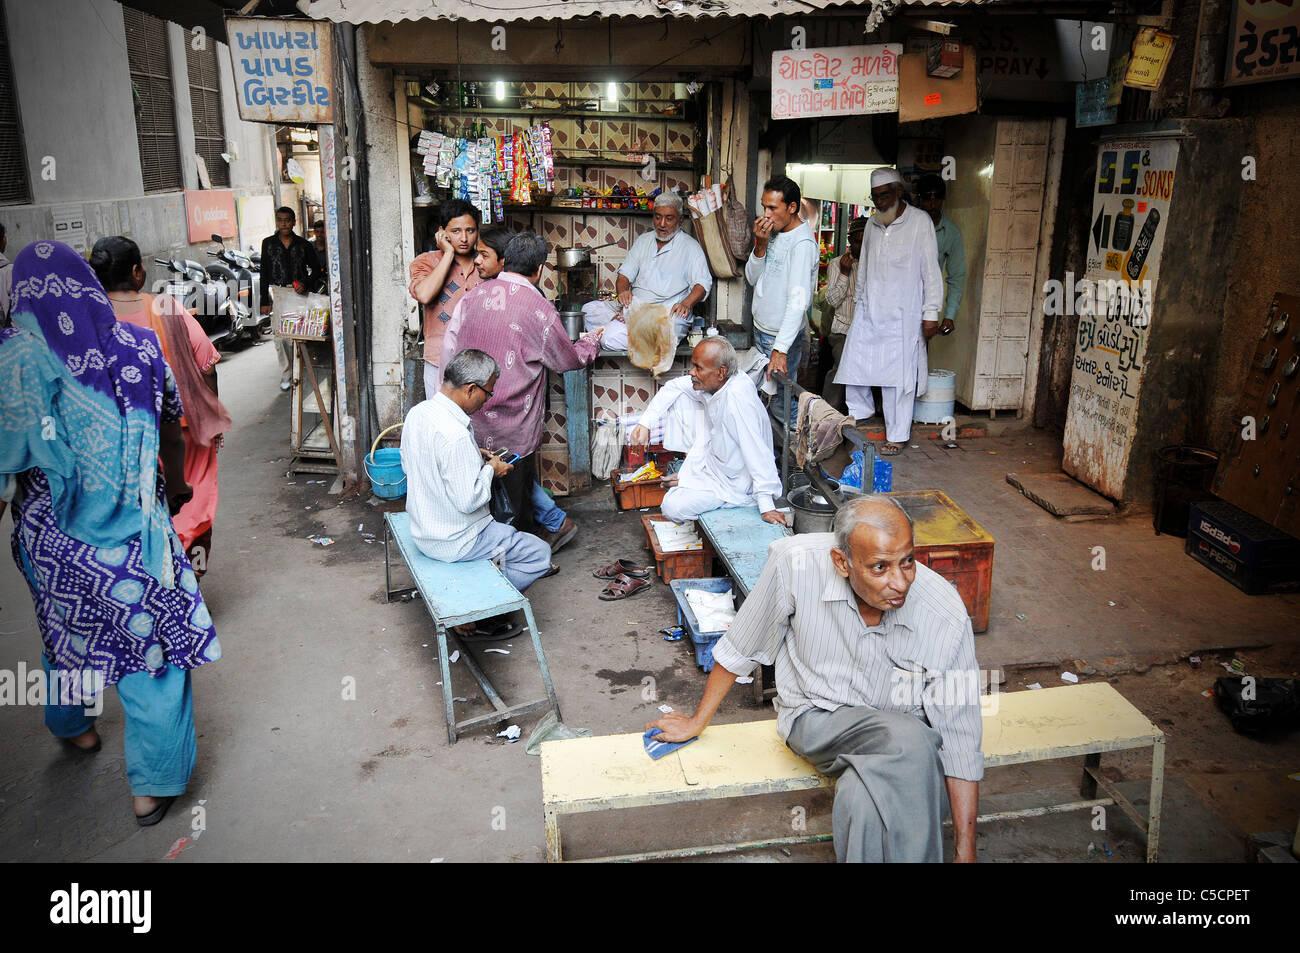 Street scene in Ahmedabad, India - Stock Image